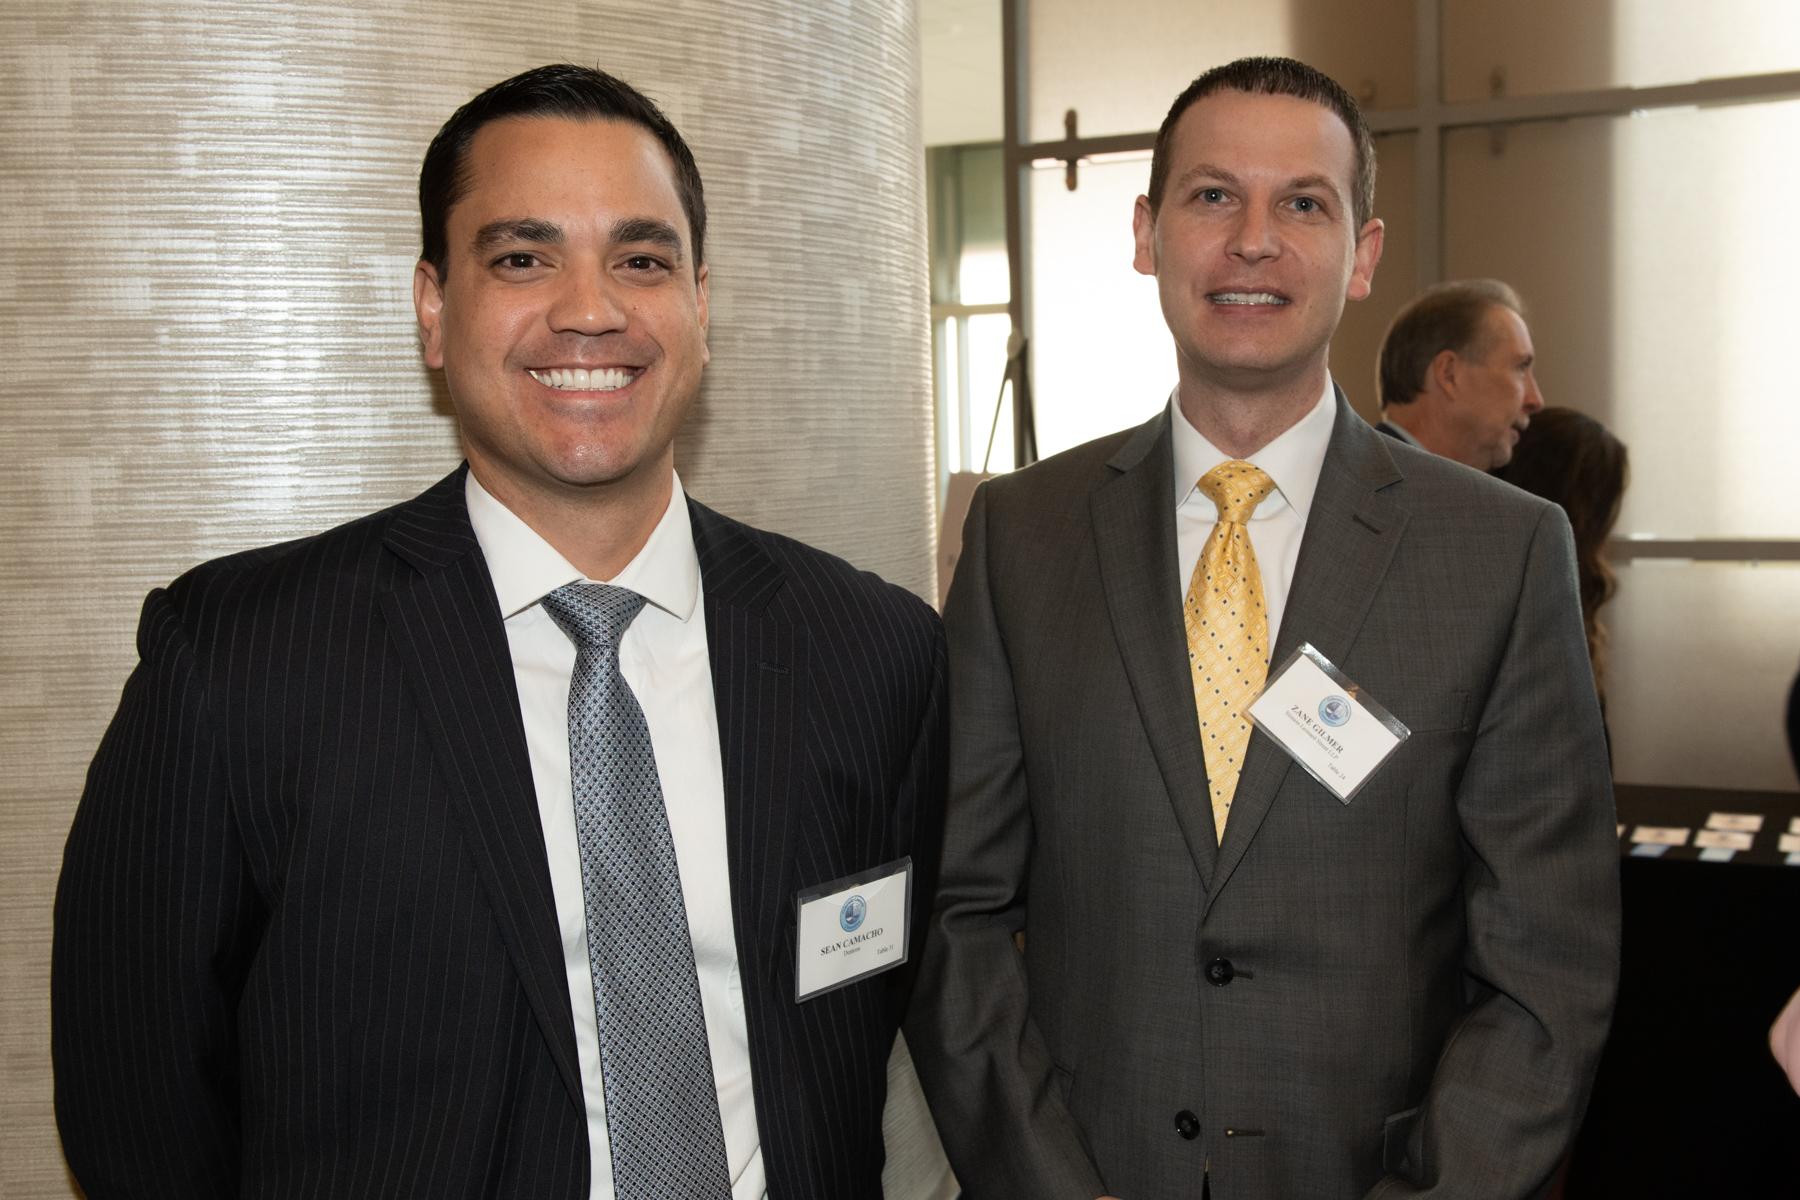 _DSC7196 Sean Camacho & Zane Gilmer (courtesy of Hartmannphoto).jpg